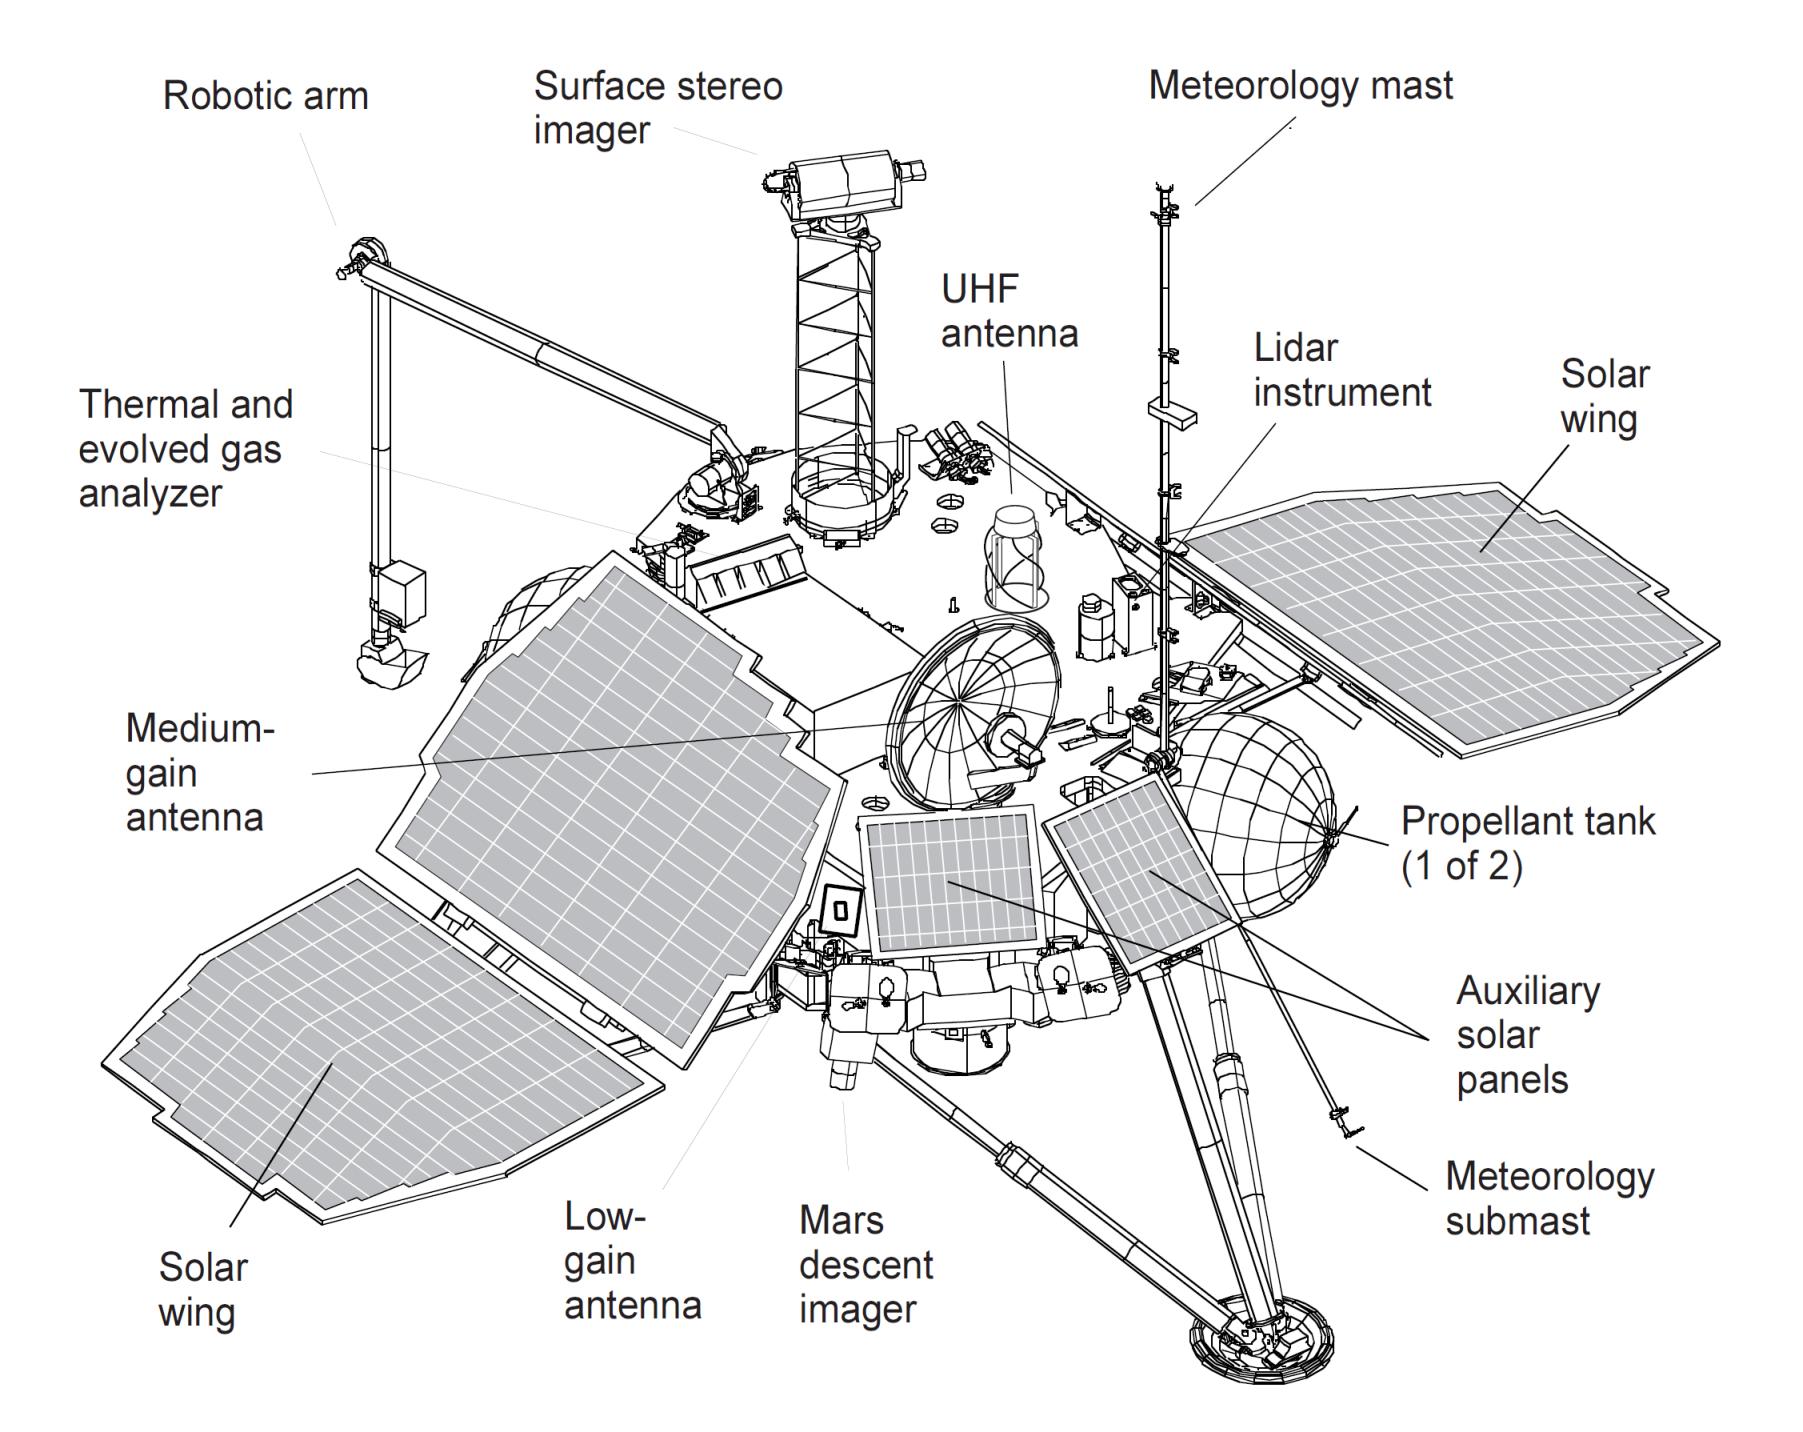 space probe mars rover diagram - photo #5